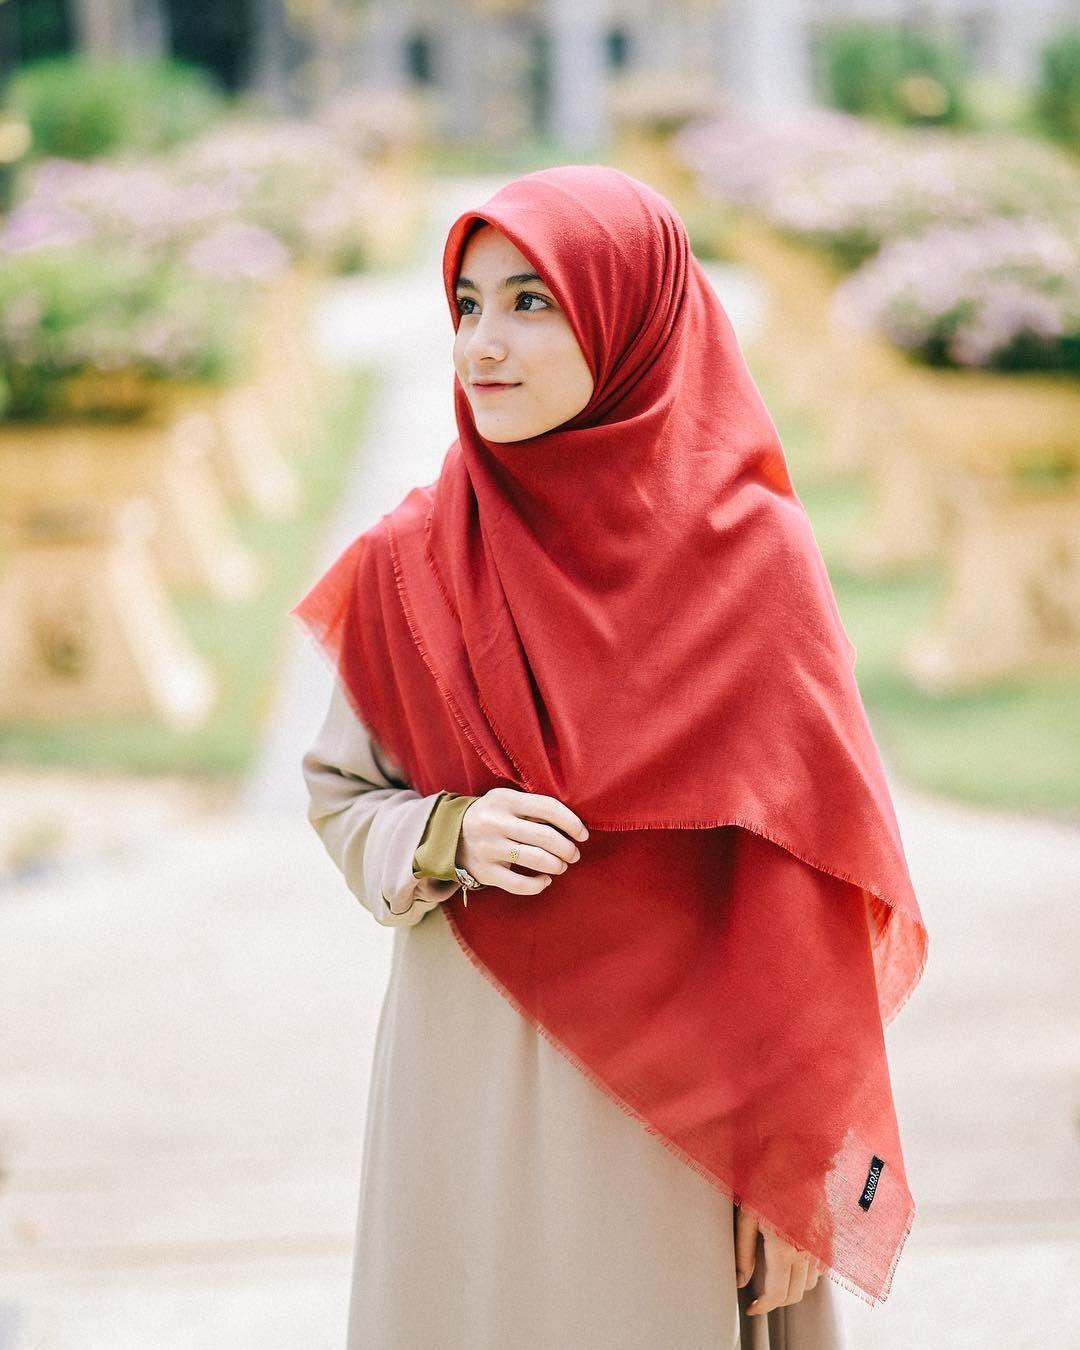 Pashmina Hijab Tutorial Pashmina Hijab Tutorial Hijab Tutorial Kebaya Turban Hijab Wedding Photography Photogr Di 2020 Gaya Hijab Model Baju Wanita Model Pakaian Hijab